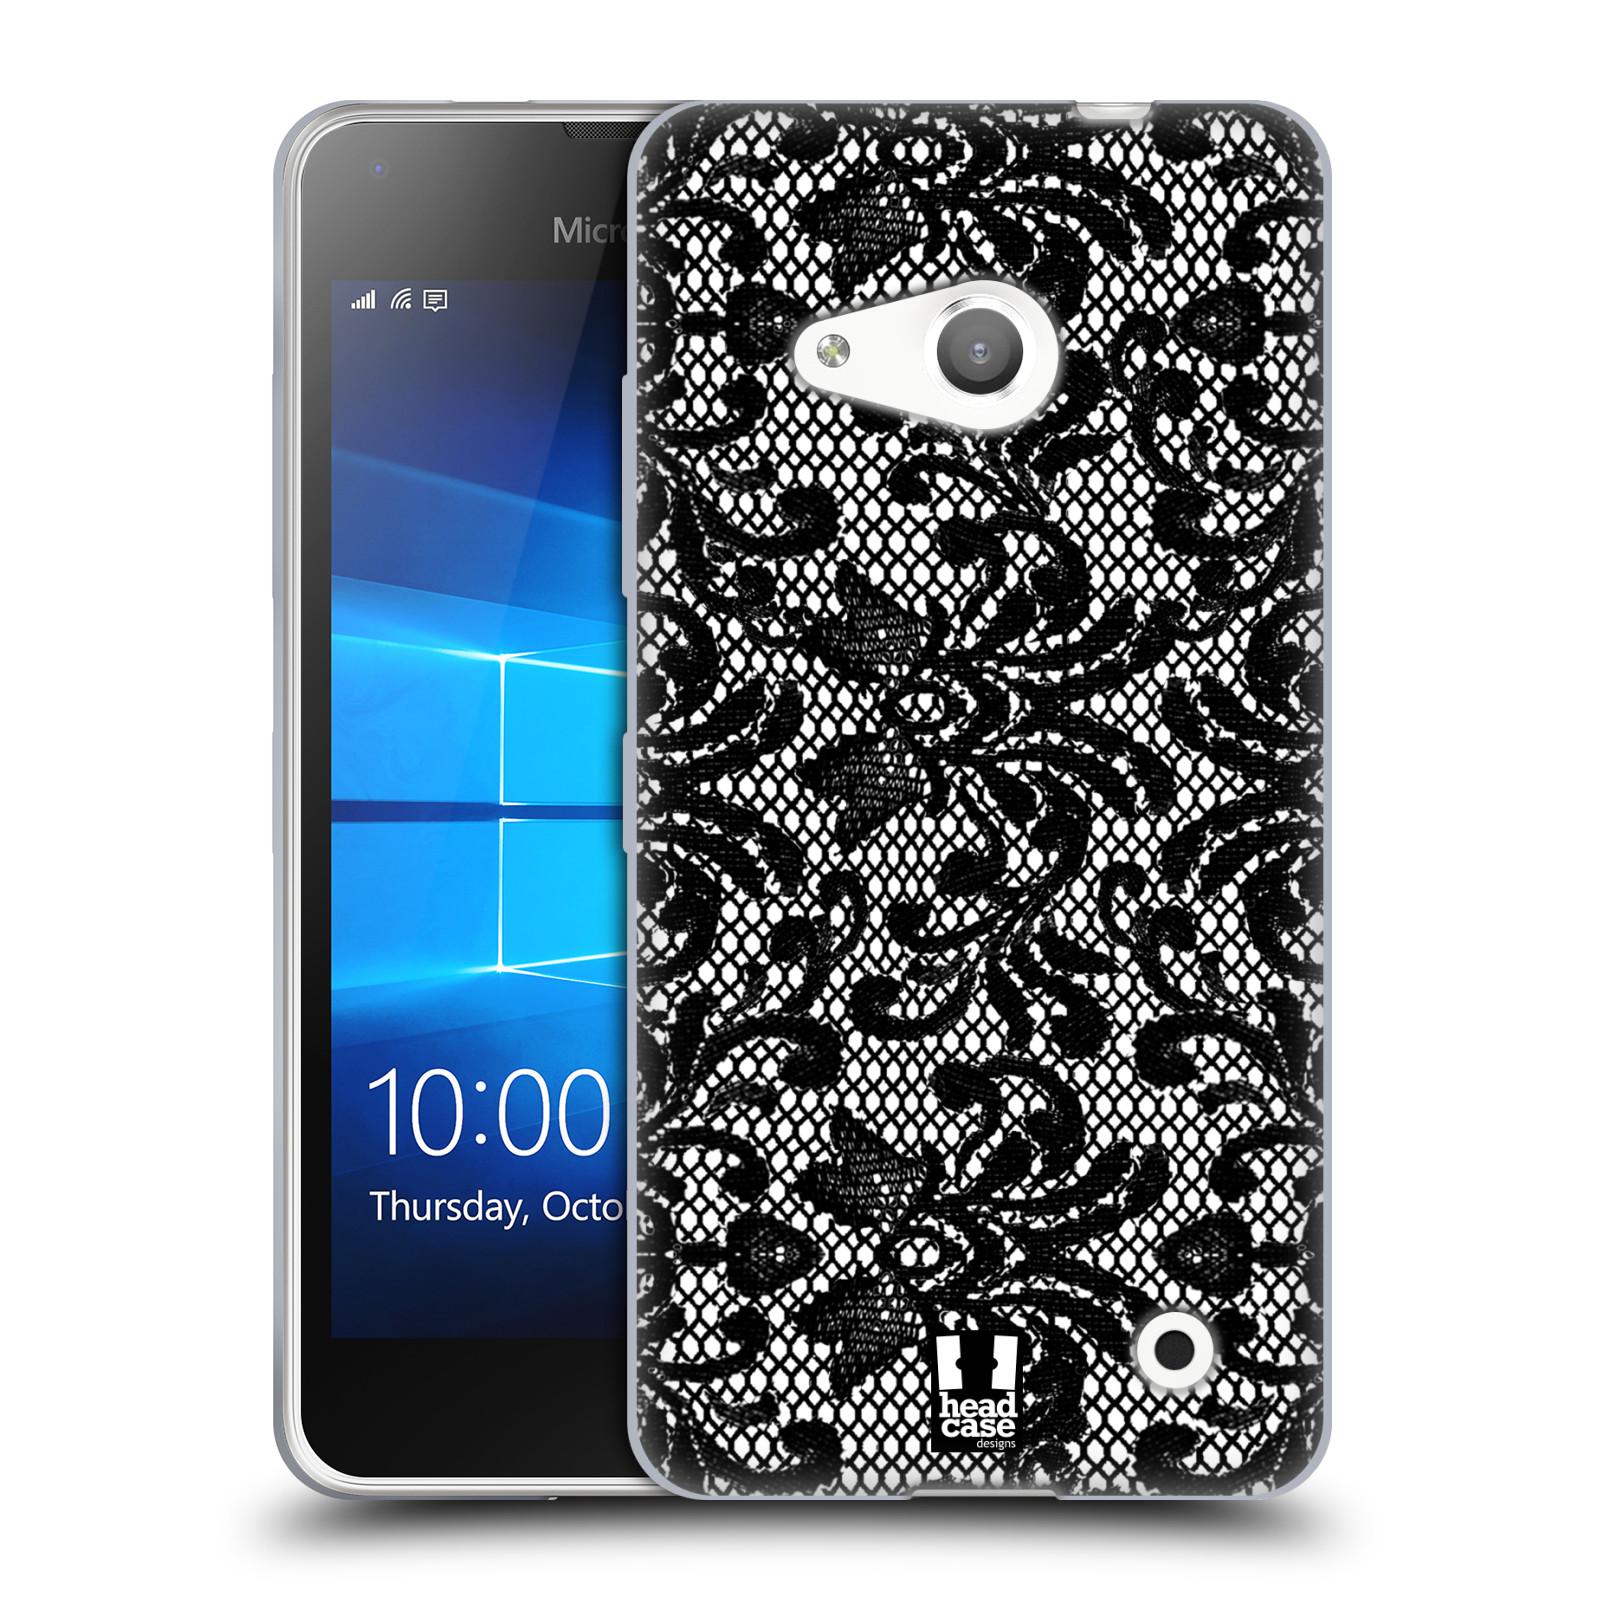 Silikonové pouzdro na mobil Microsoft Lumia 550 HEAD CASE KRAJKA (Silikonový kryt či obal na mobilní telefon Microsoft Lumia 550)